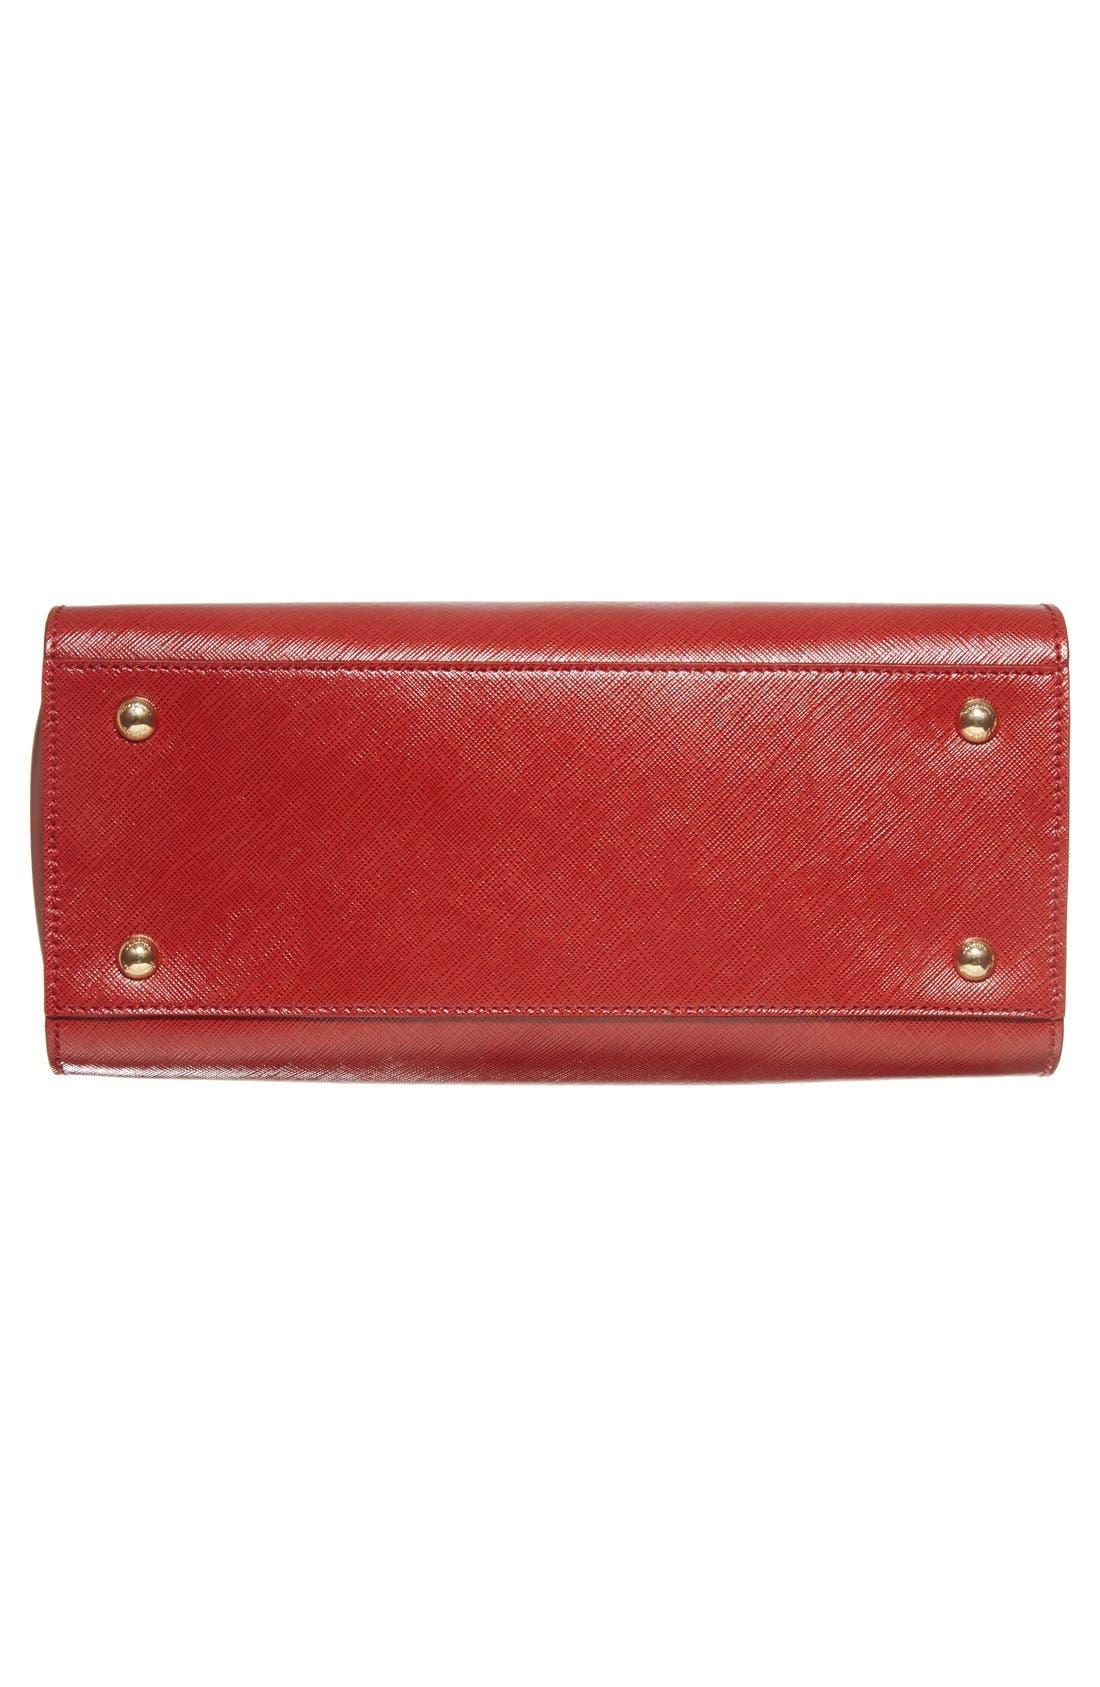 Small Saffiano Leather Tote,                             Alternate thumbnail 12, color,